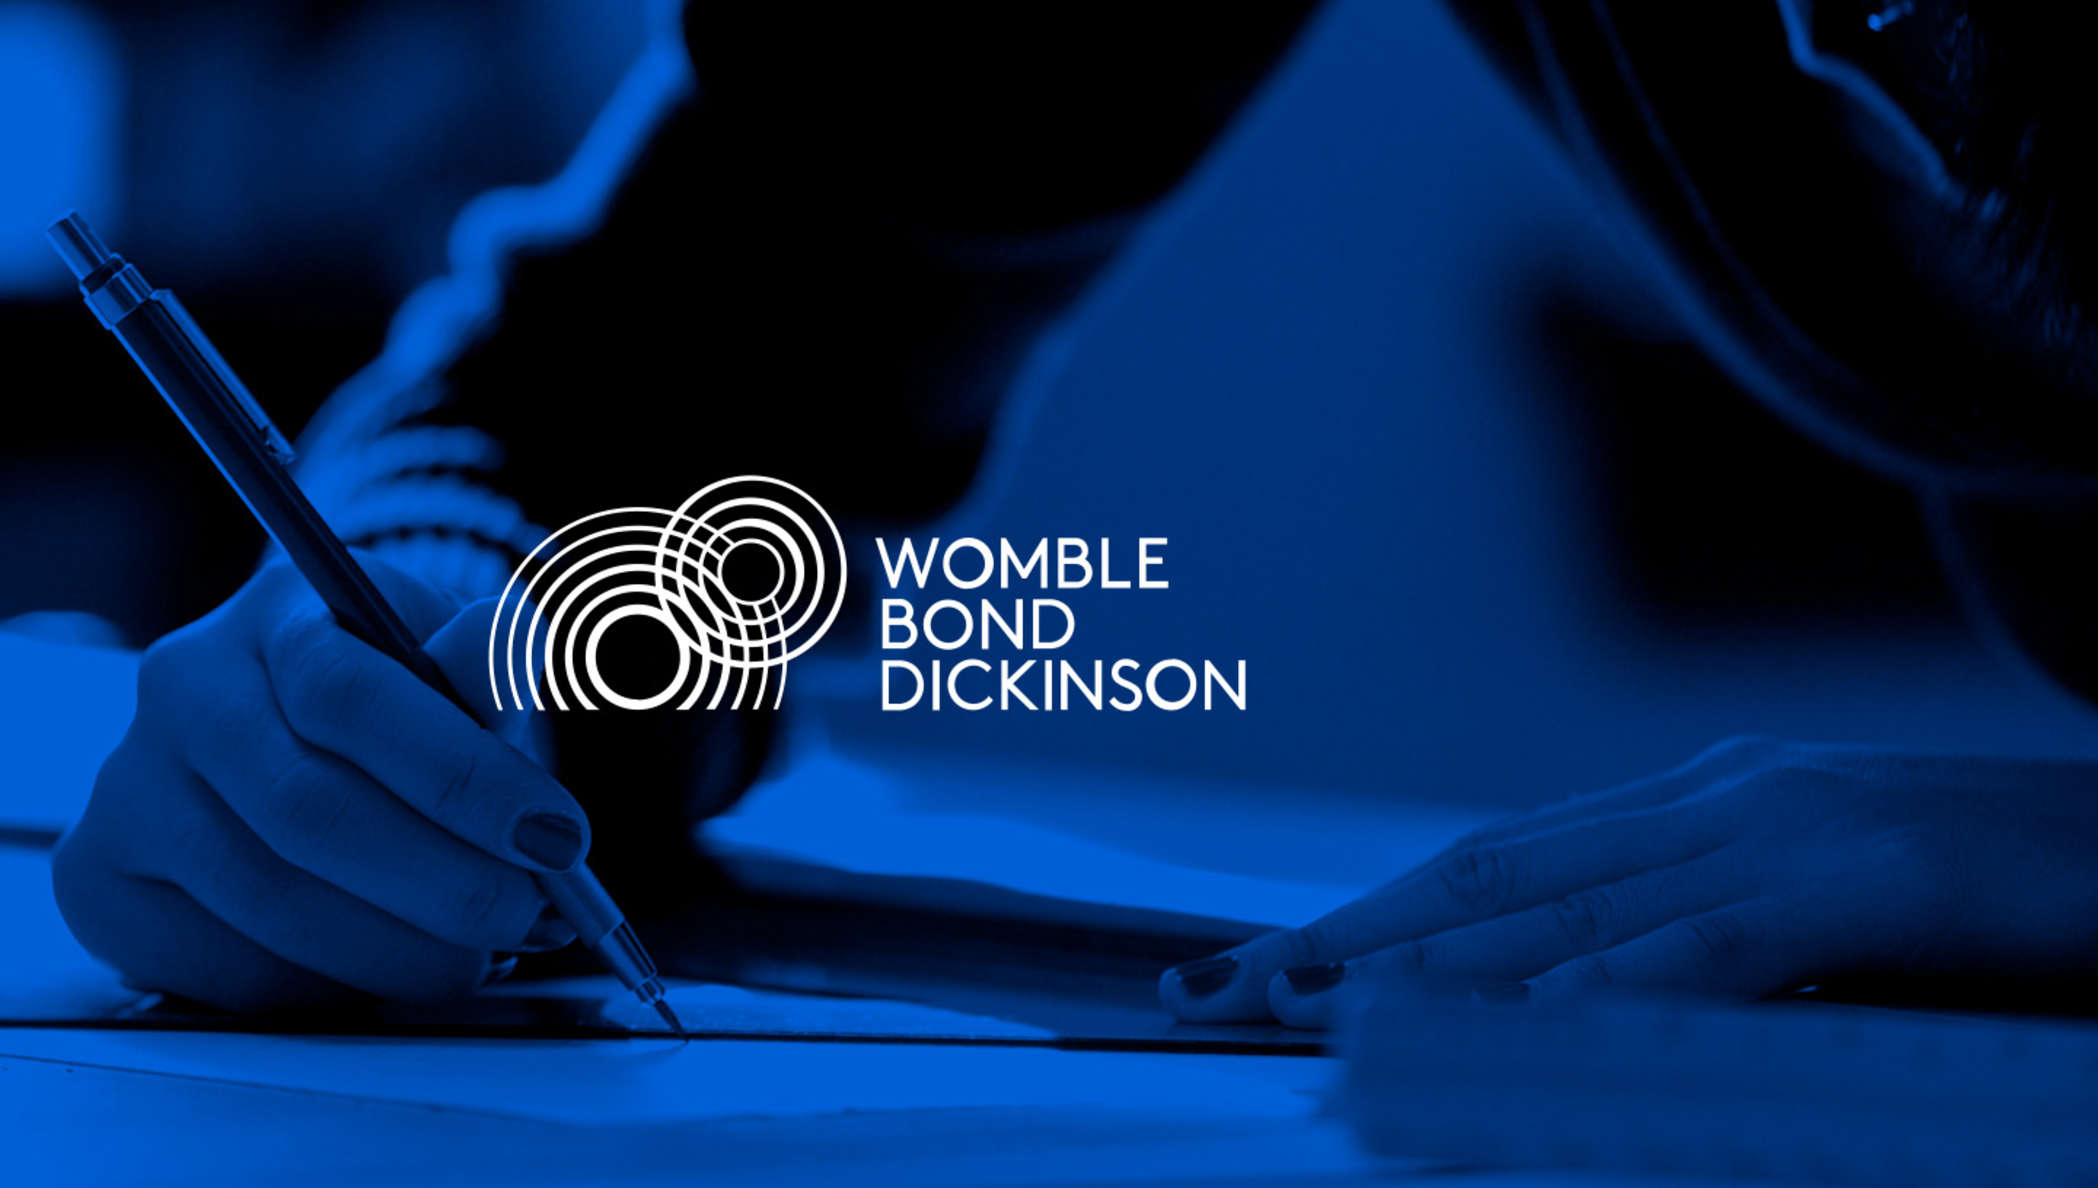 Womble Bond Dickinson Case Study